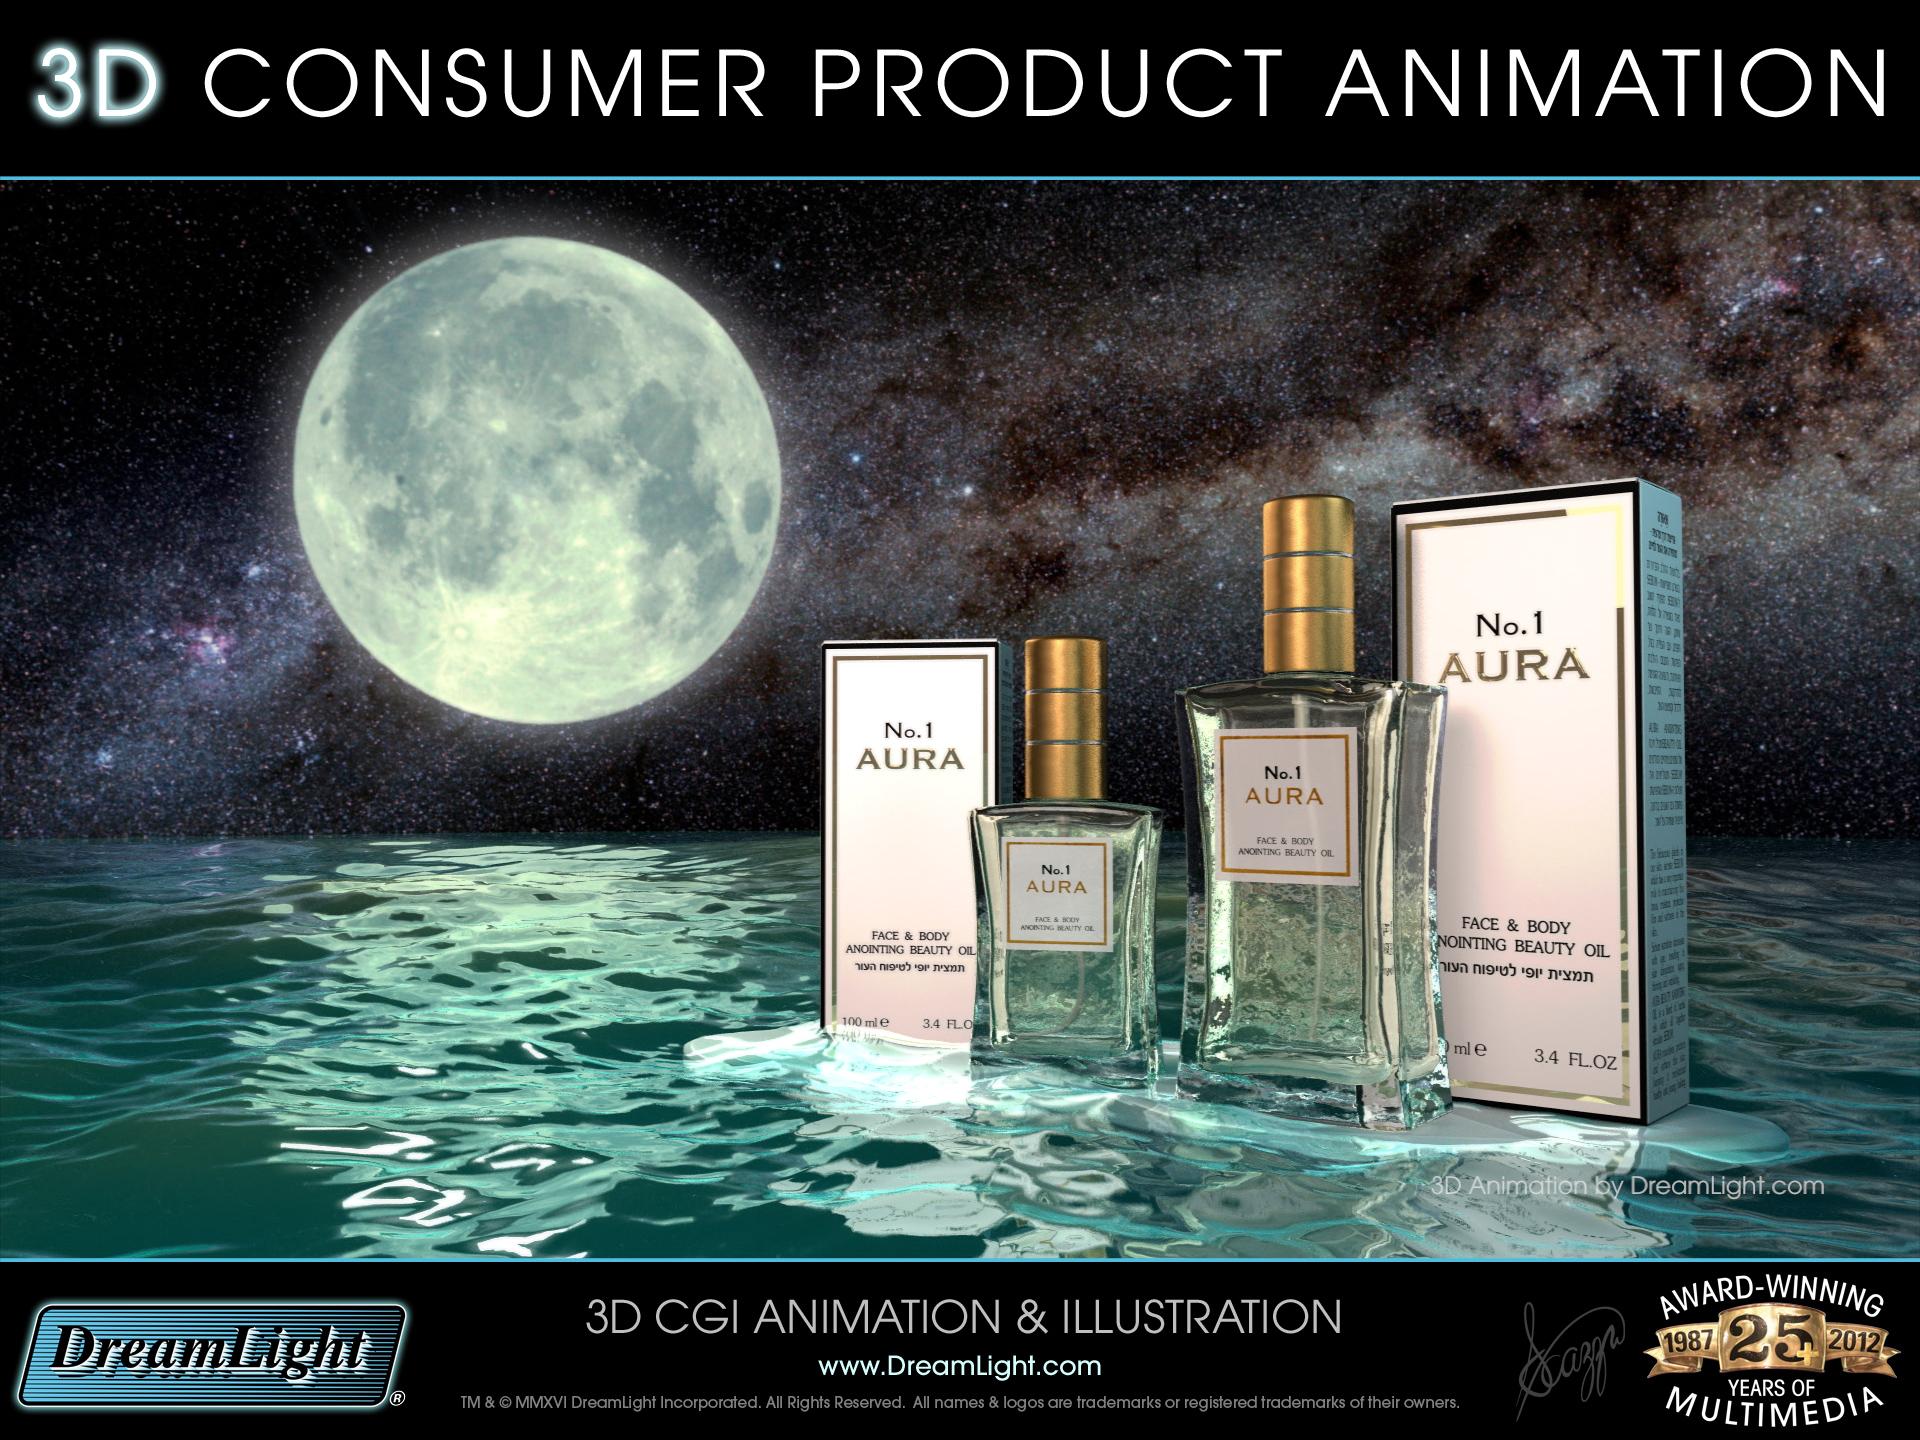 3D Consumer Product Animation - DreamLight com - Wilmington, MA